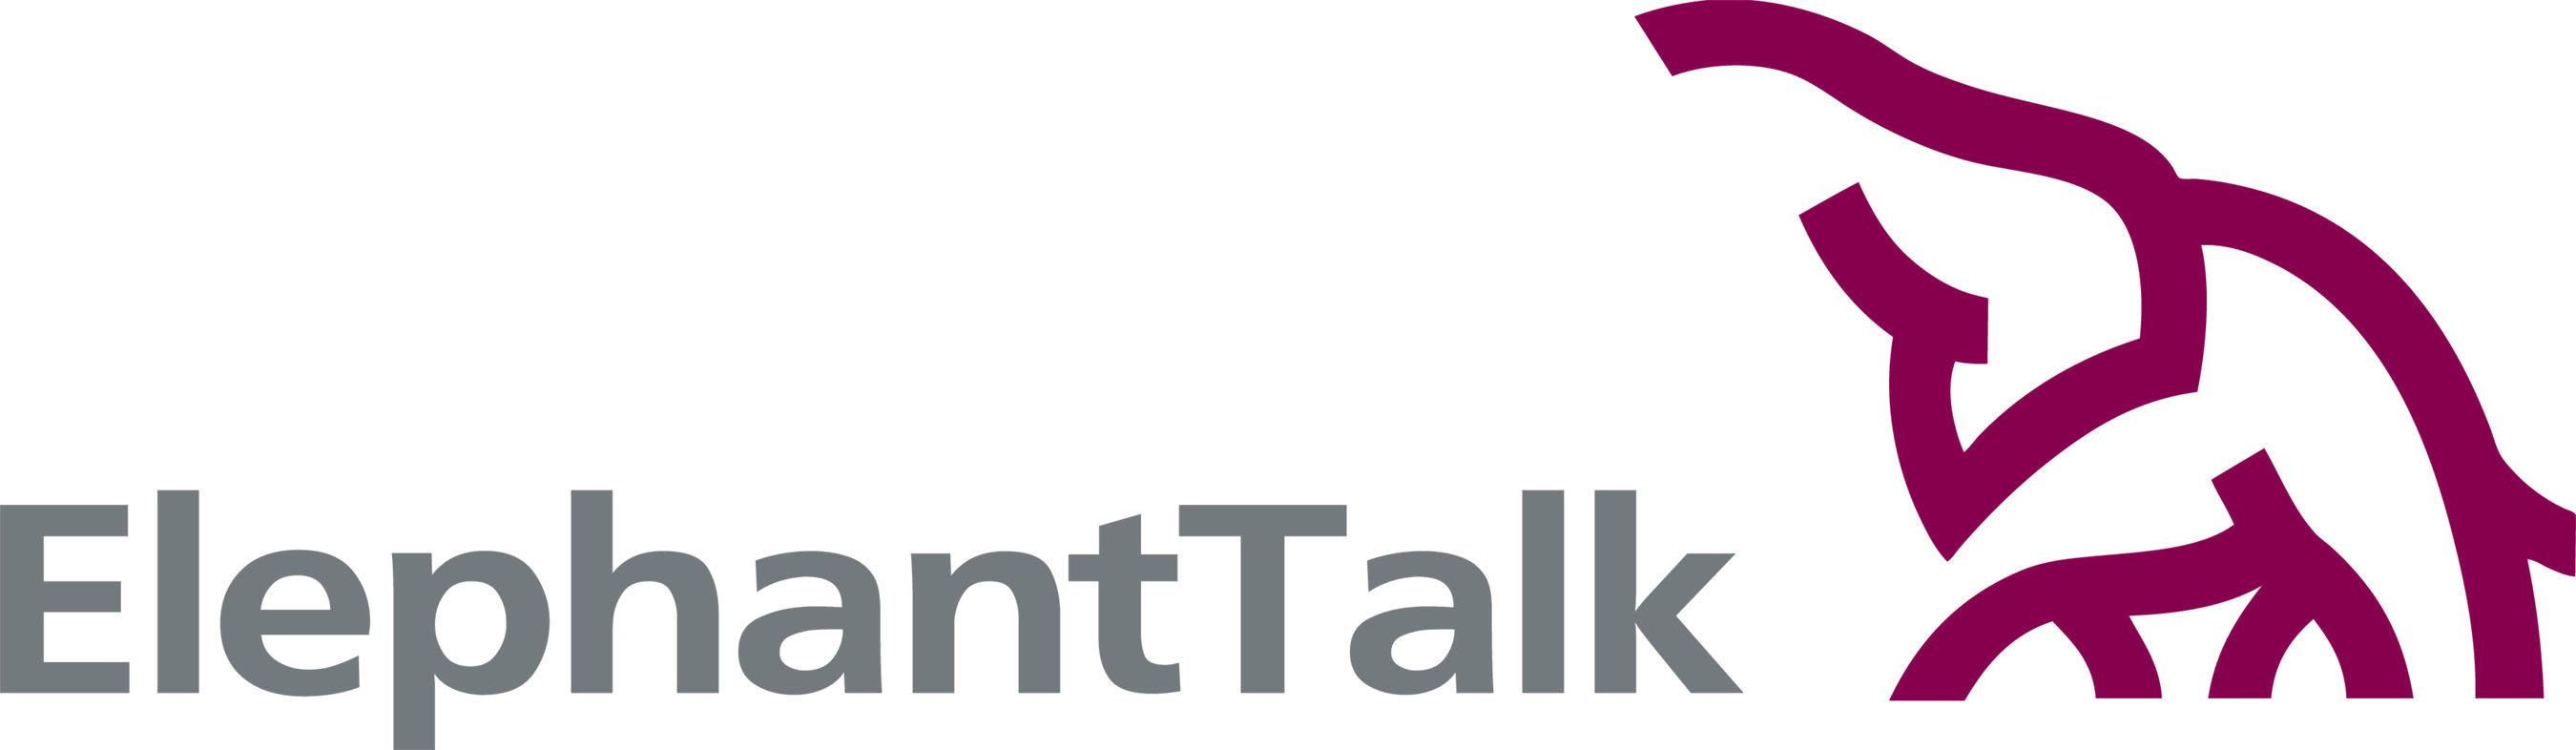 Elephant Talk Communications' Logo